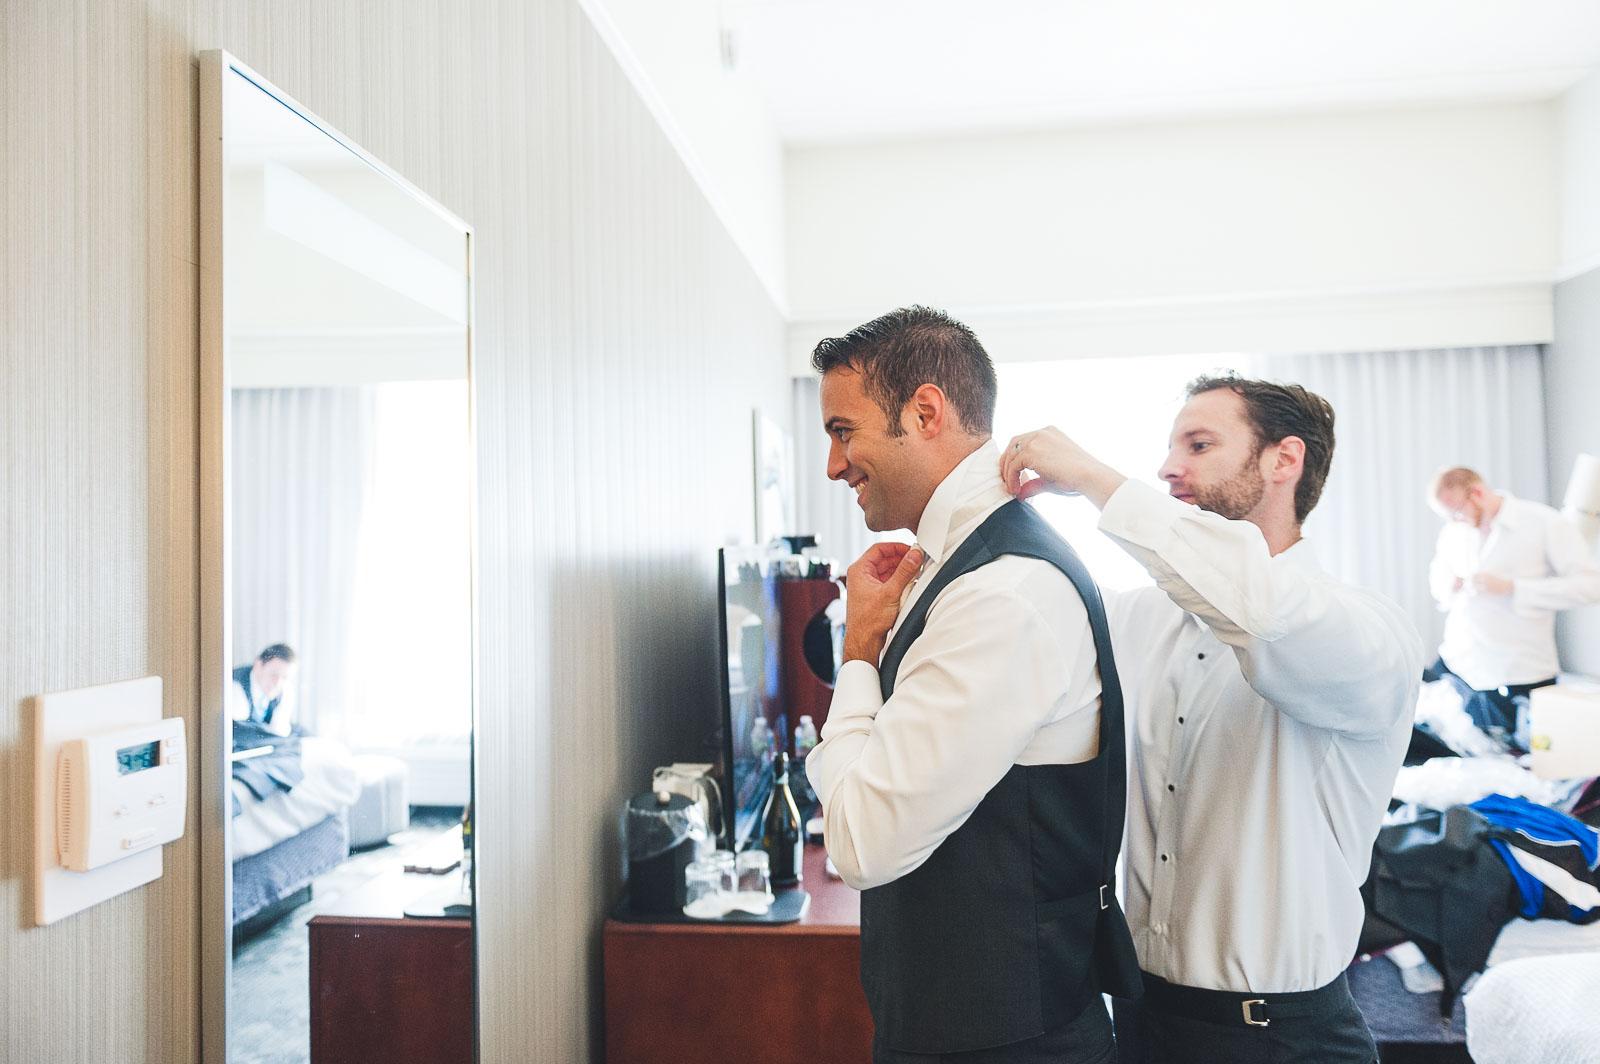 Groom gets help with tie